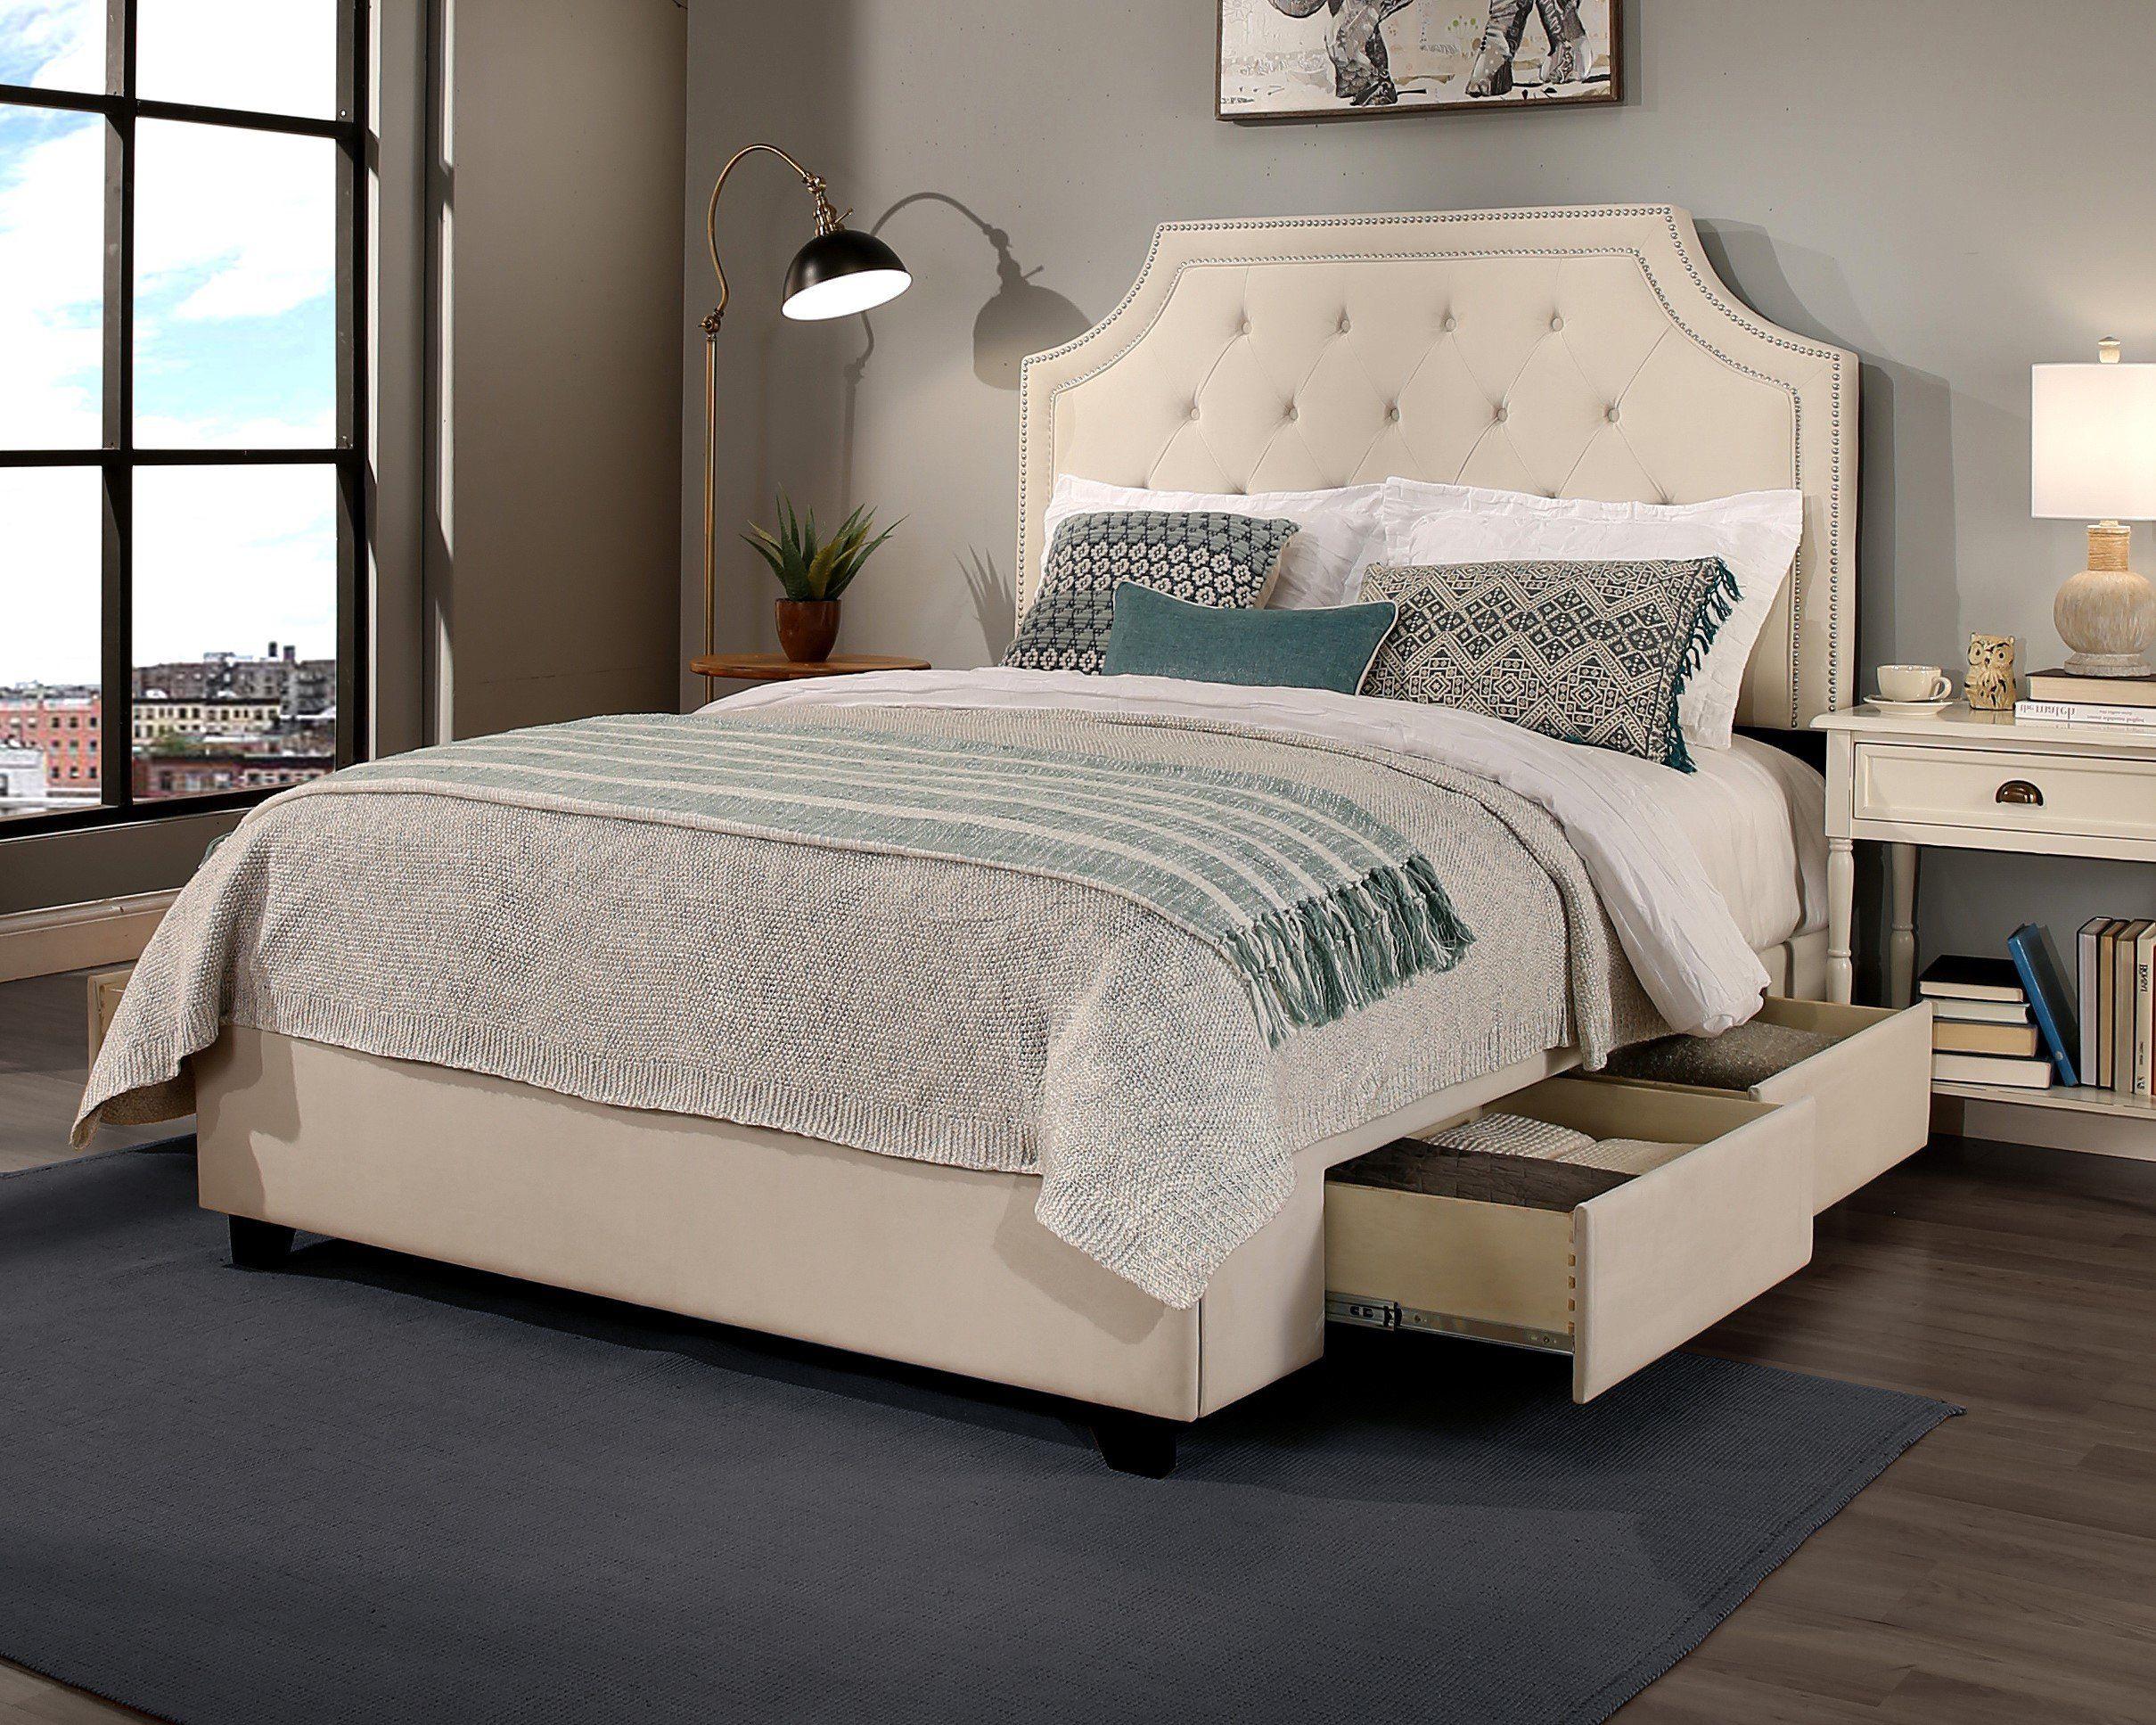 Devitt Tufted Upholstered Low Profile Storage Platform Bed King Upholstered Bed King Size Storage Bed Queen Size Storage Bed